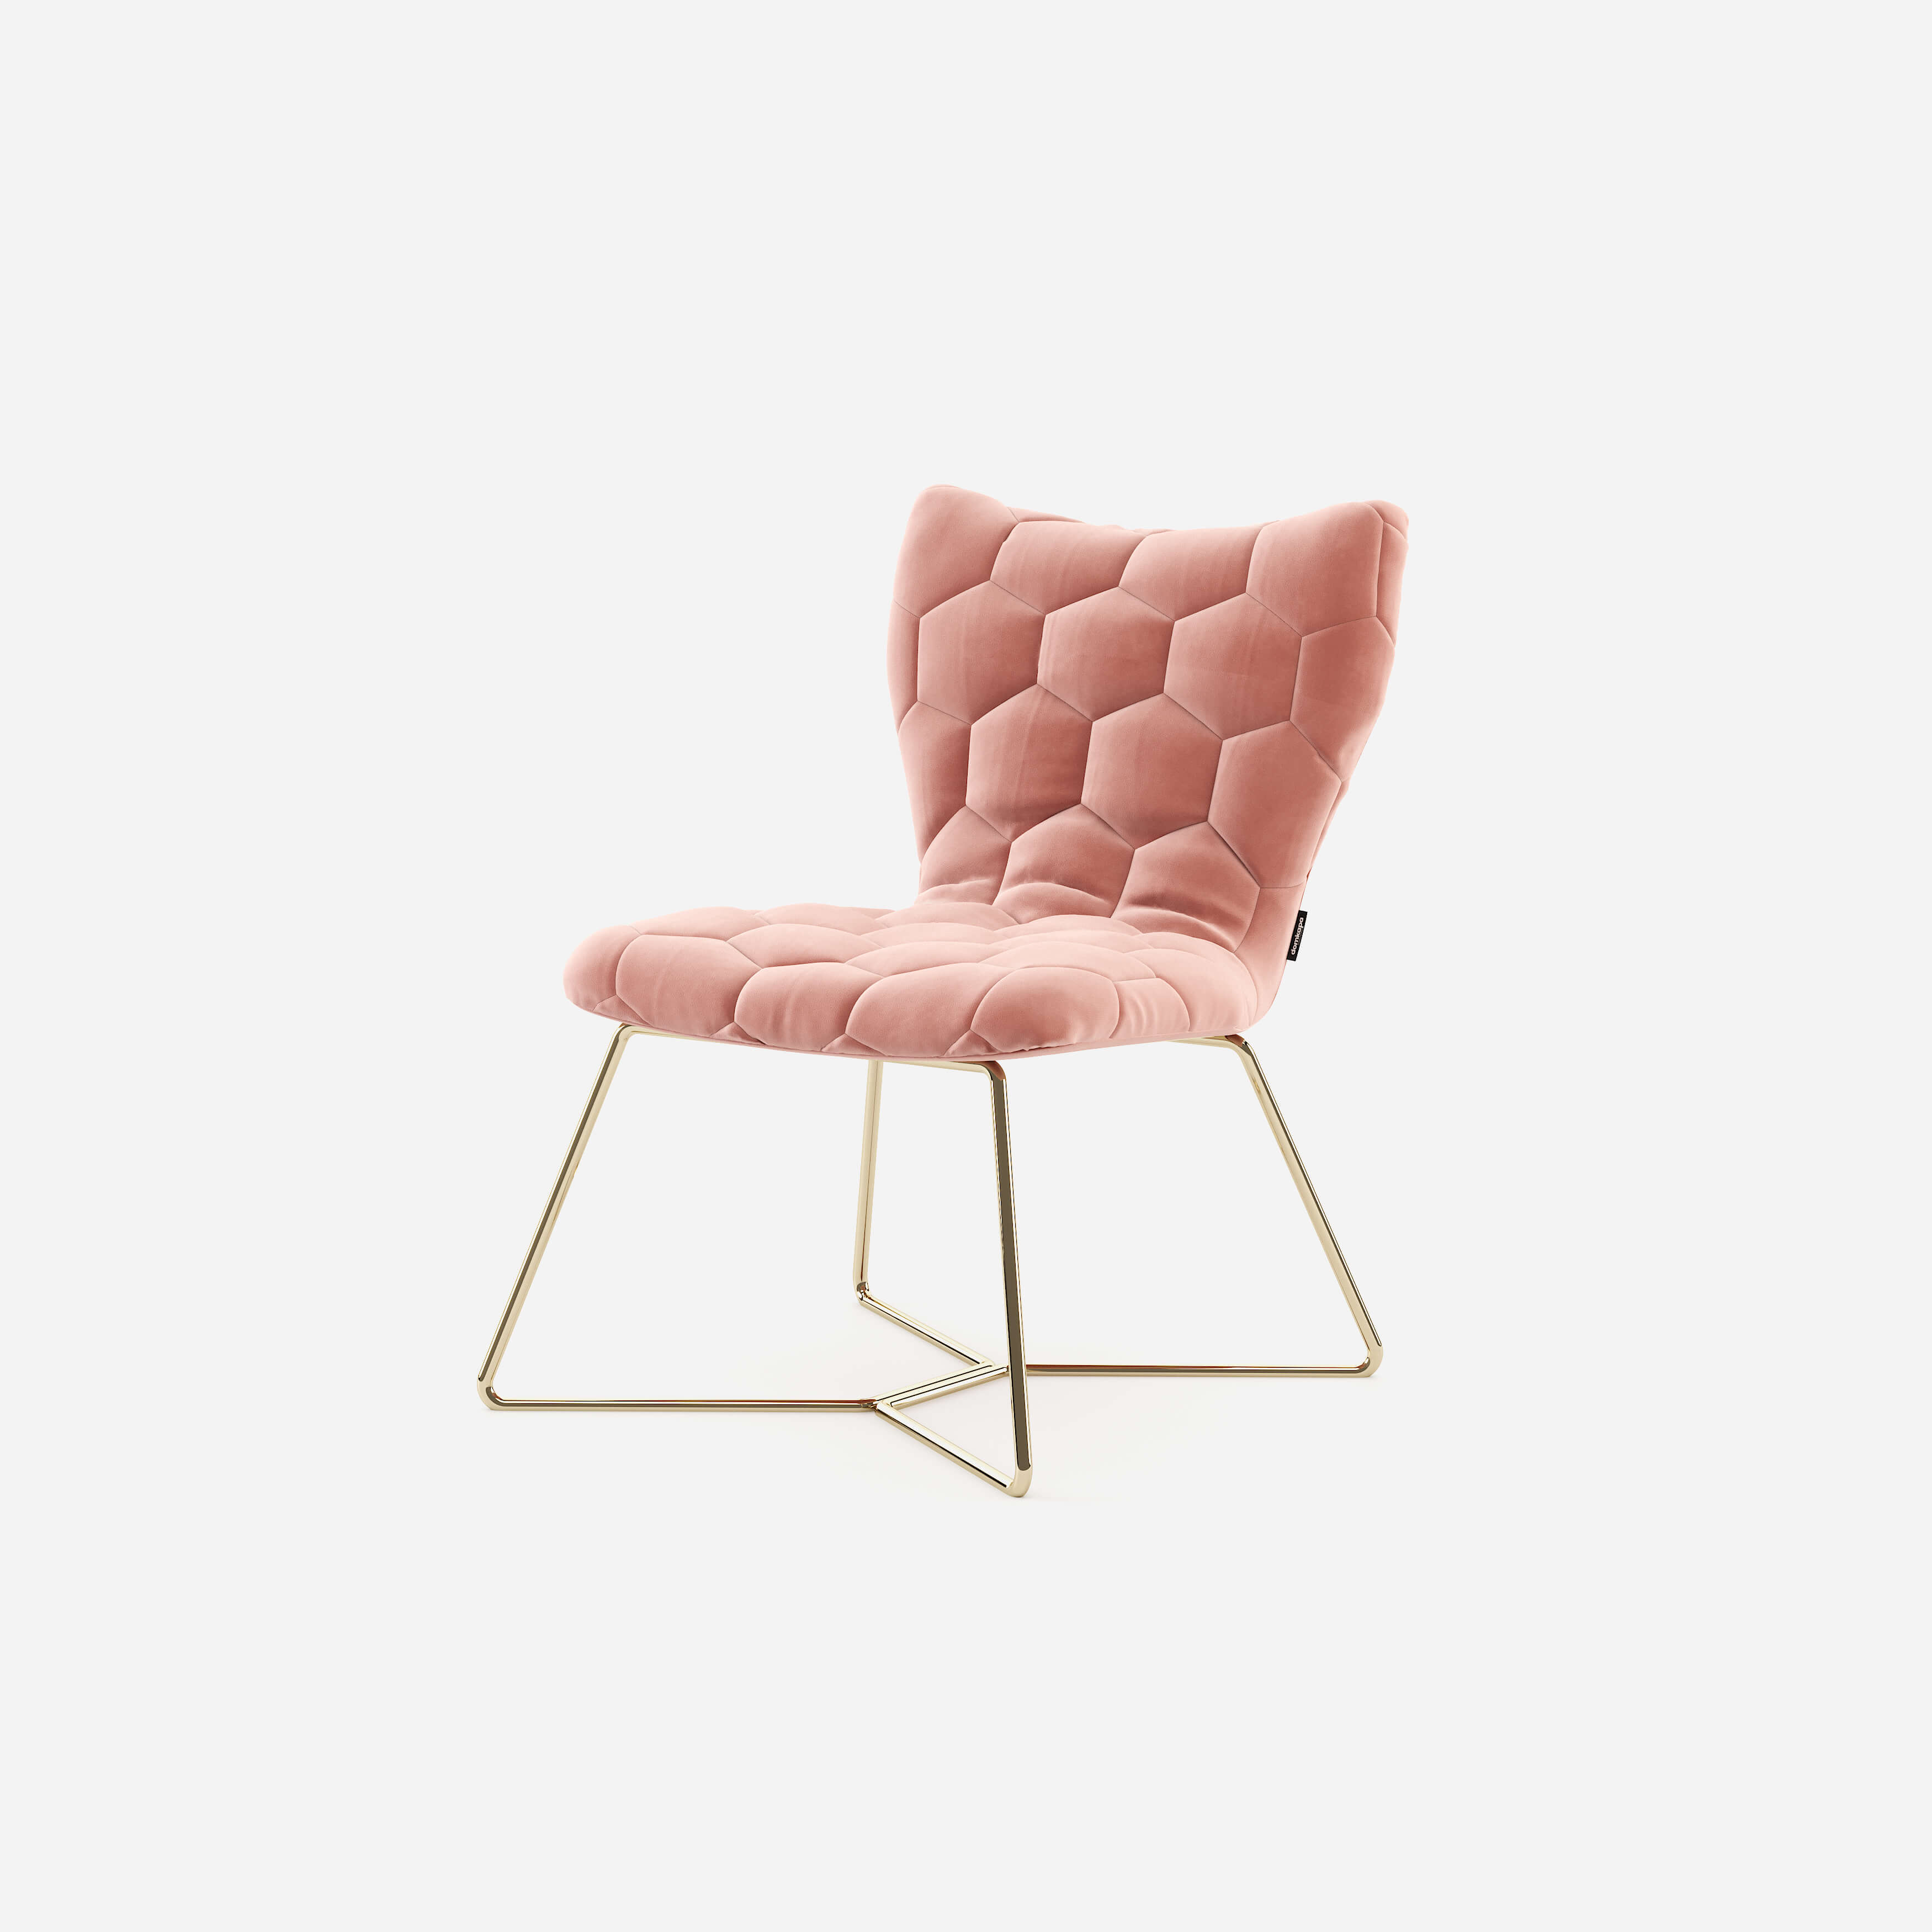 kelly-chair-velvet-pink-metal-gold-living-room-interior-design-home-decor-1